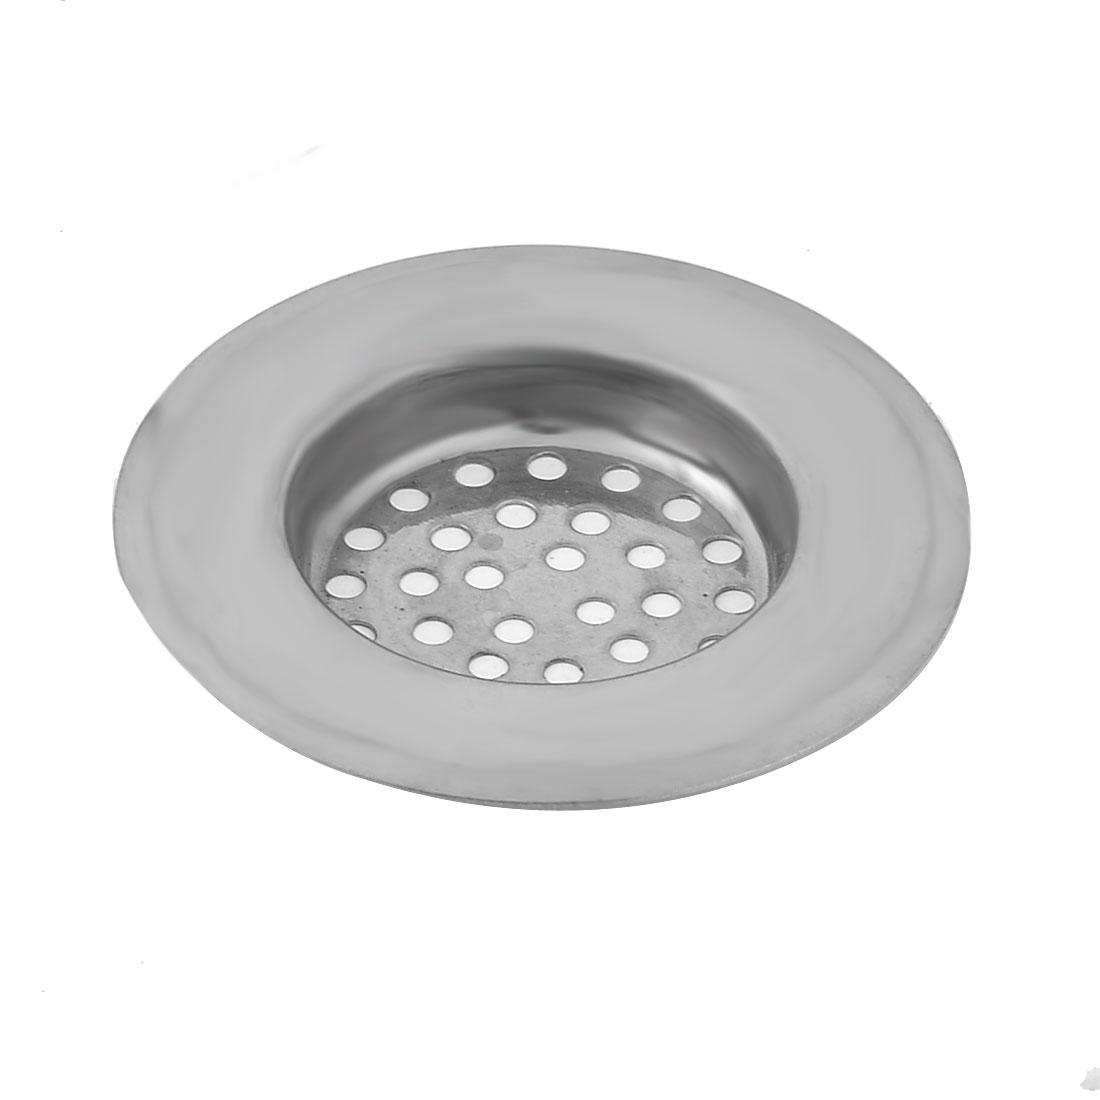 Home Bathroom Kitchen Sink Strainer Drainer Screen Filter Stopper Sliver Tone